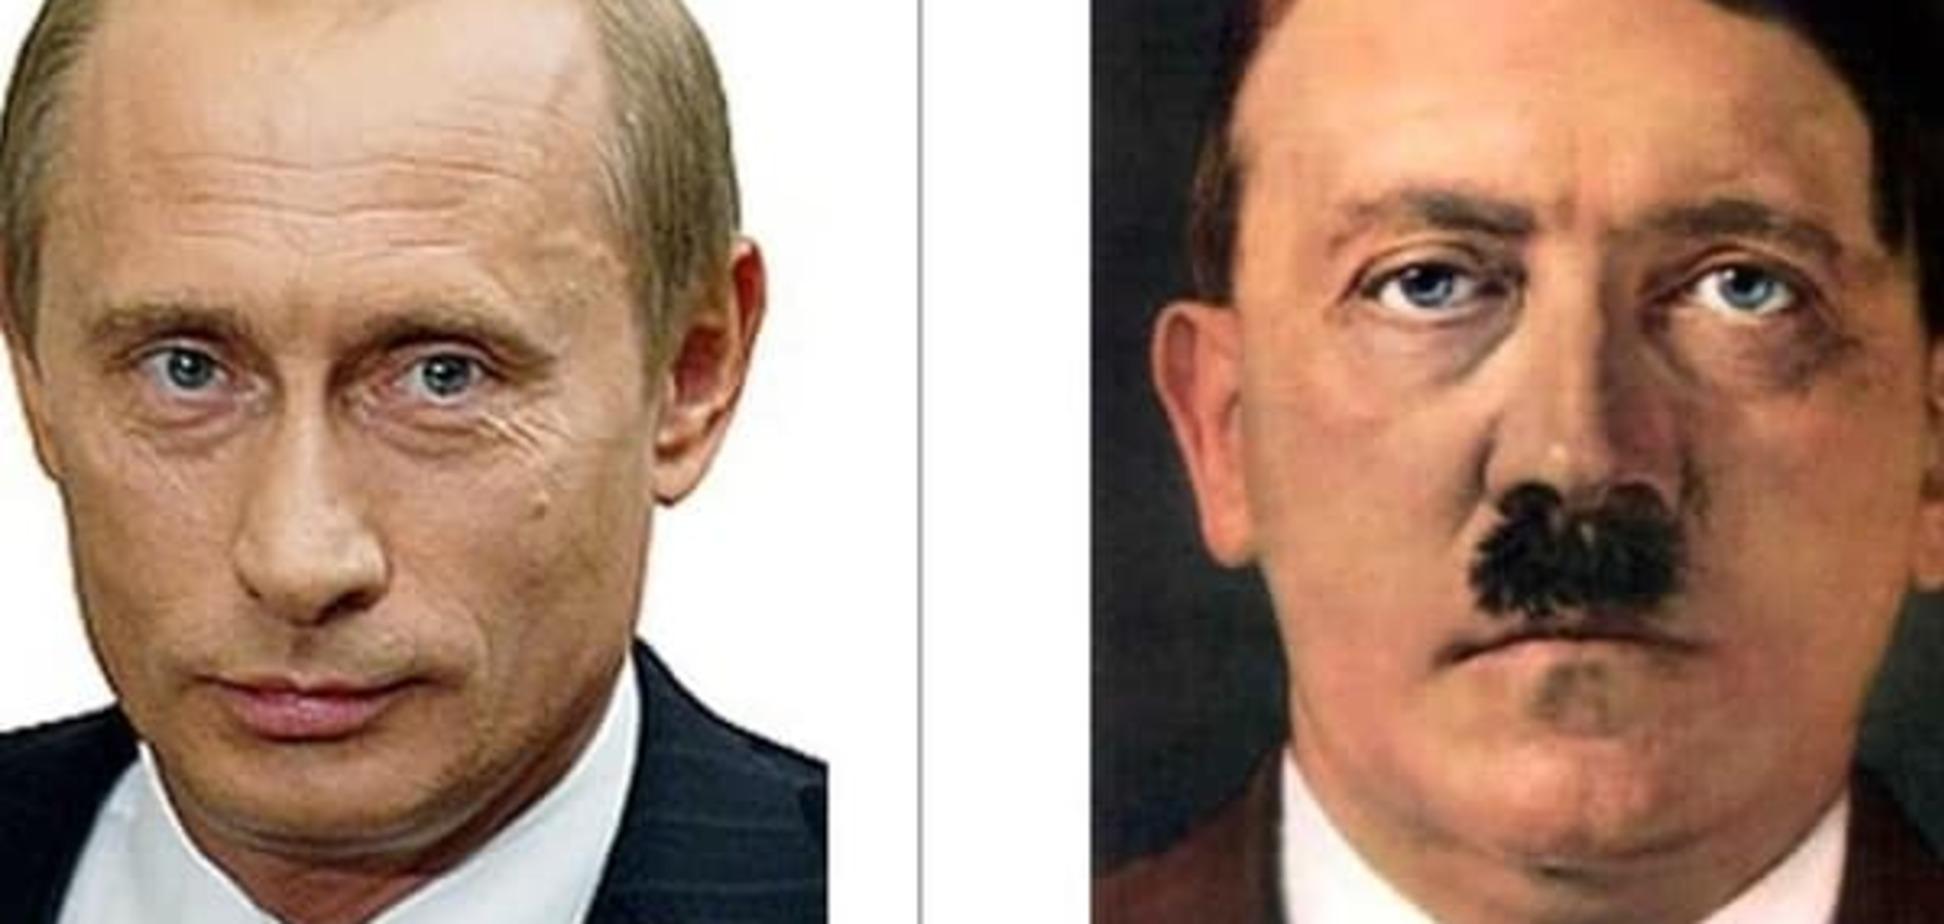 В сети сравнили рисунок собаки Гитлера и кошку Путина